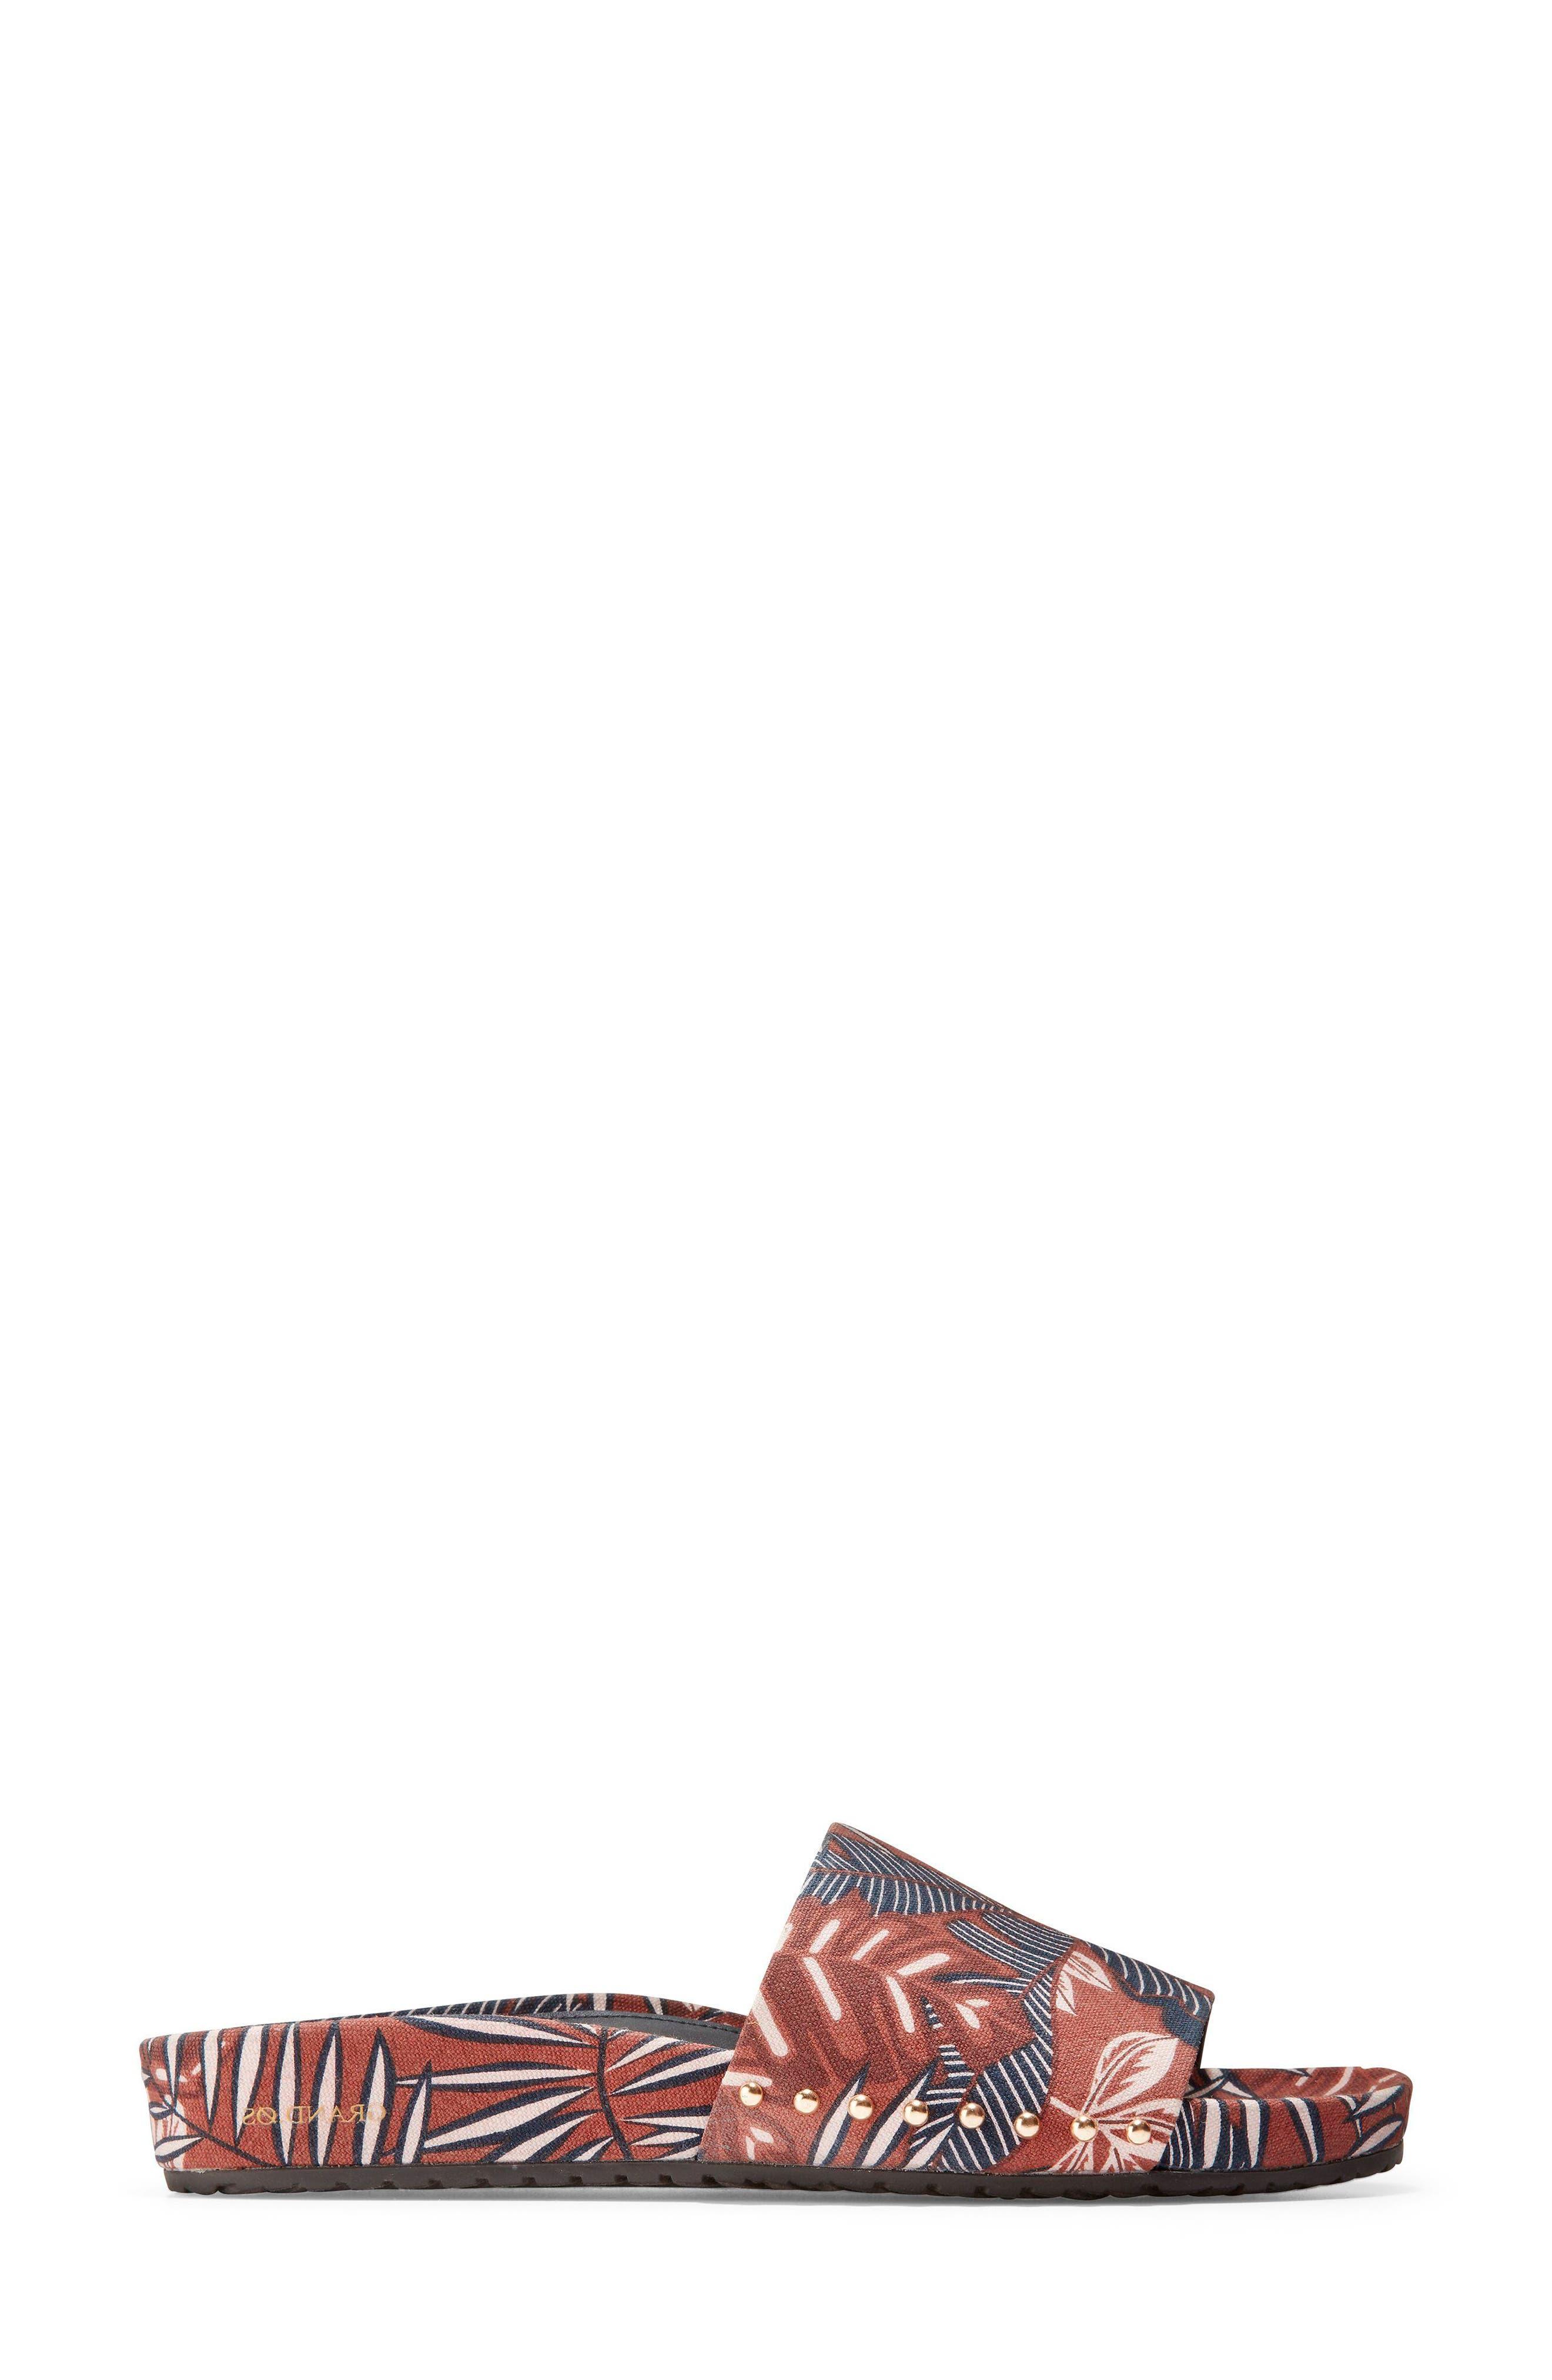 Pinch Montauk Print Slide Sandal,                             Alternate thumbnail 3, color,                             Tropical Palm Print Fabric